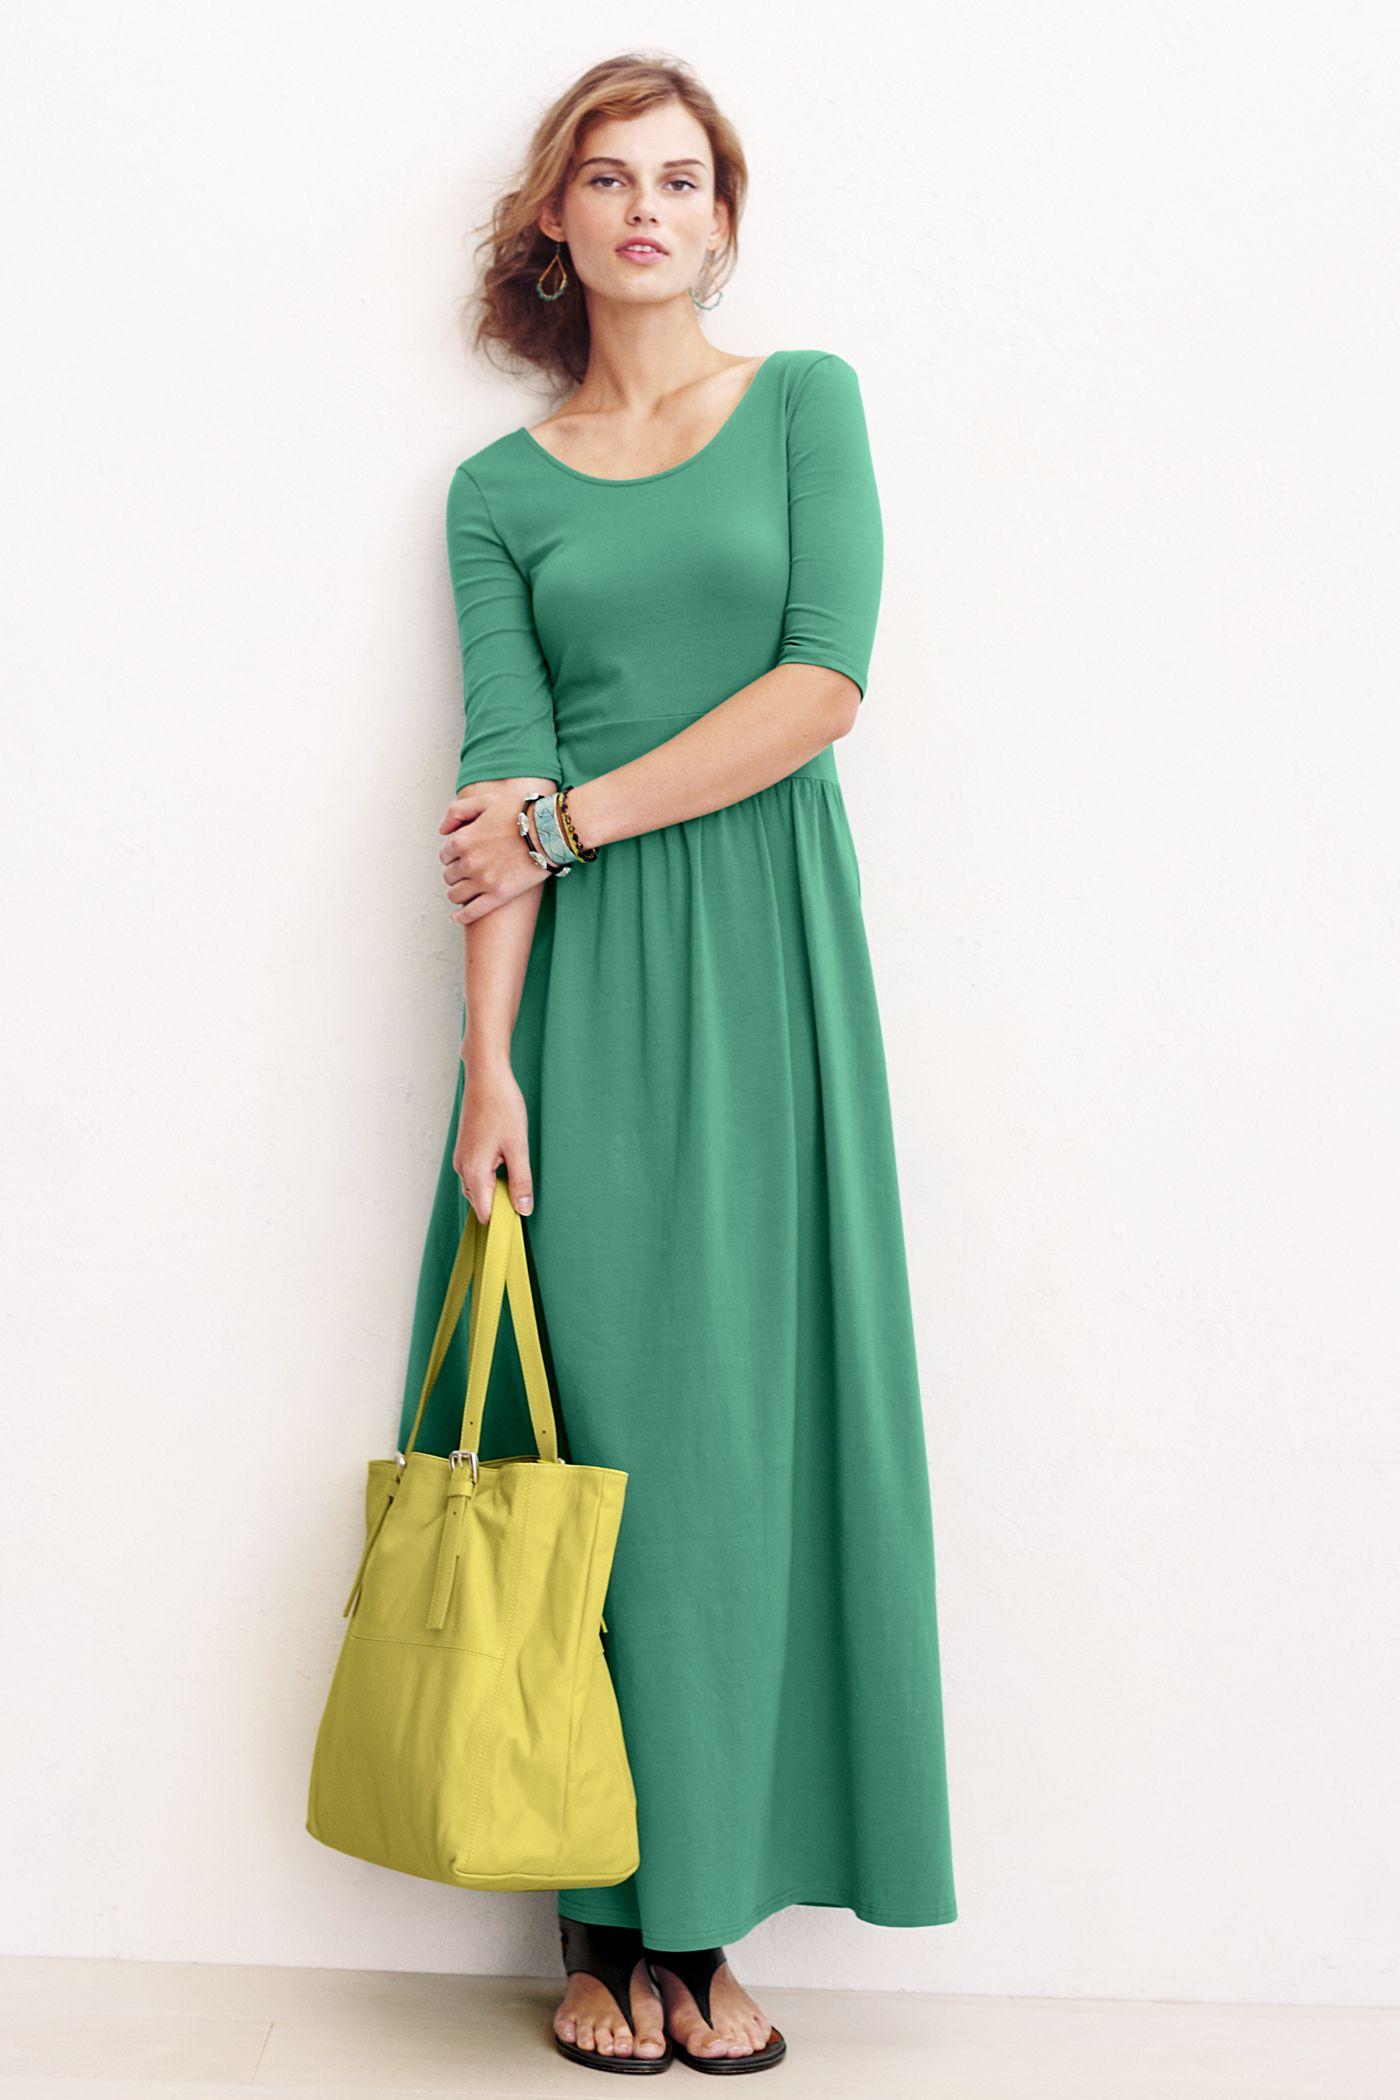 Doublescoop maxi dress lovely clothes pinterest maxi dresses